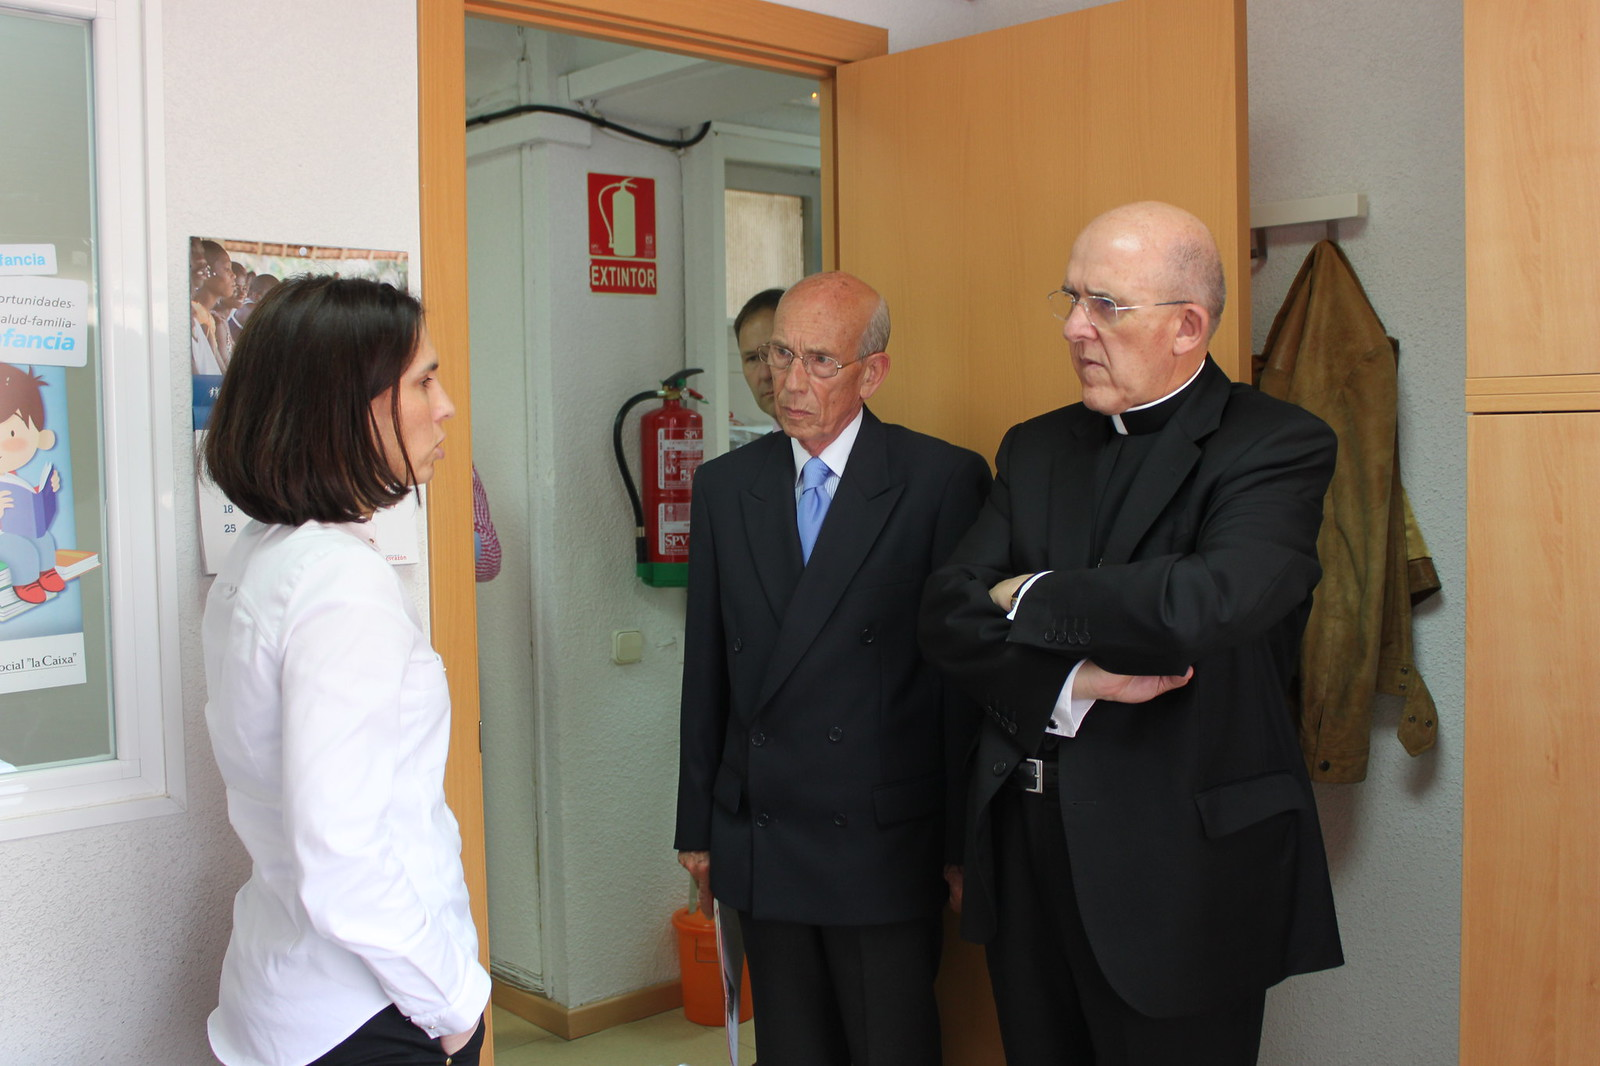 FOTOS en la WEB de Cáritas Madrid